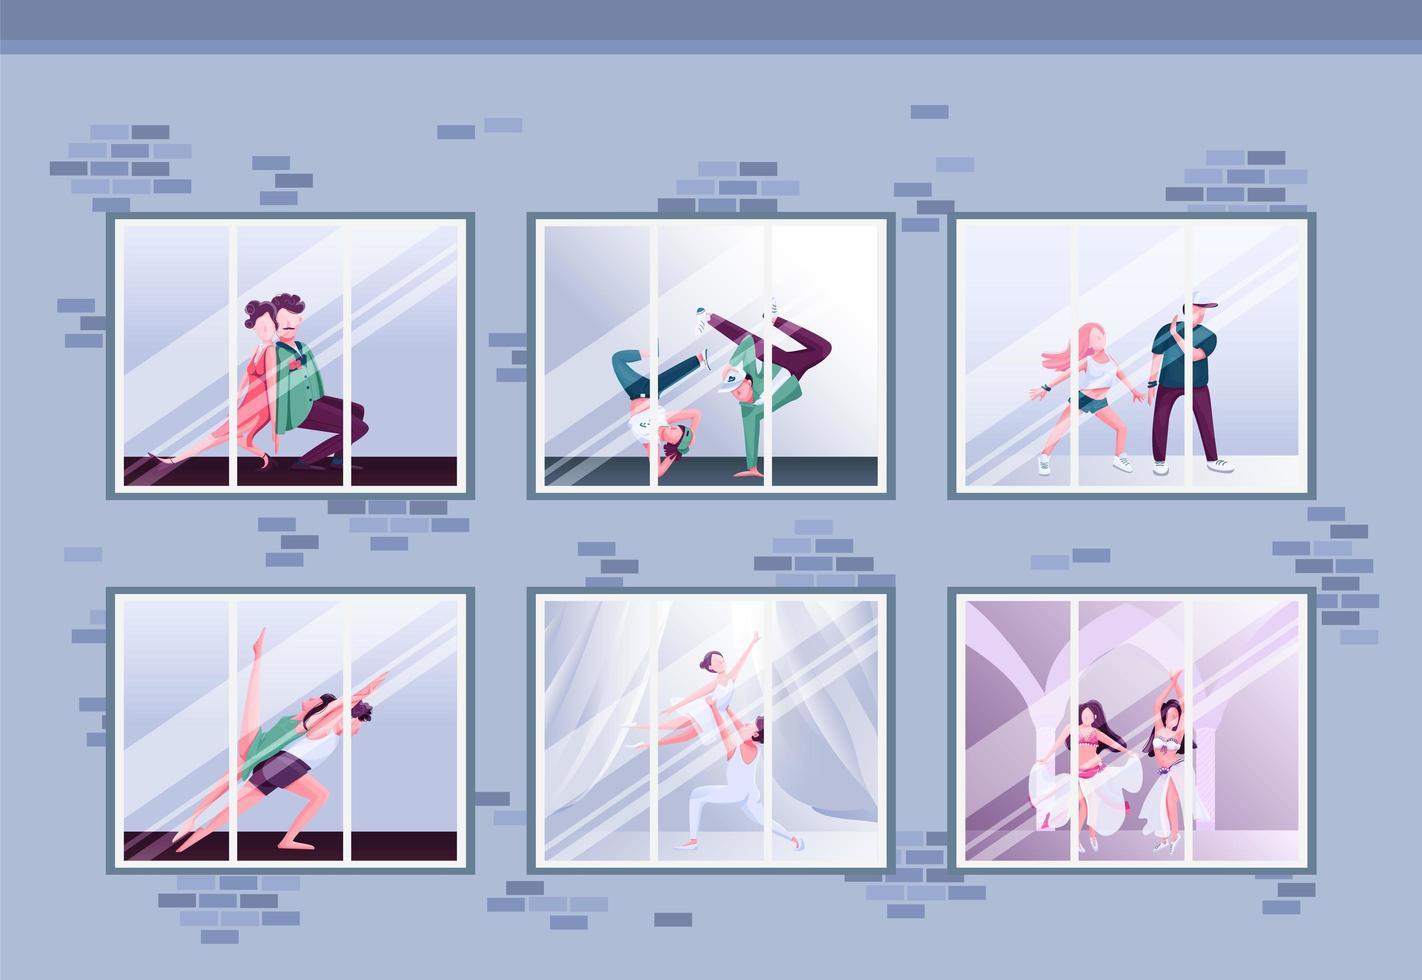 ventanas de la clase de baile matutino vector